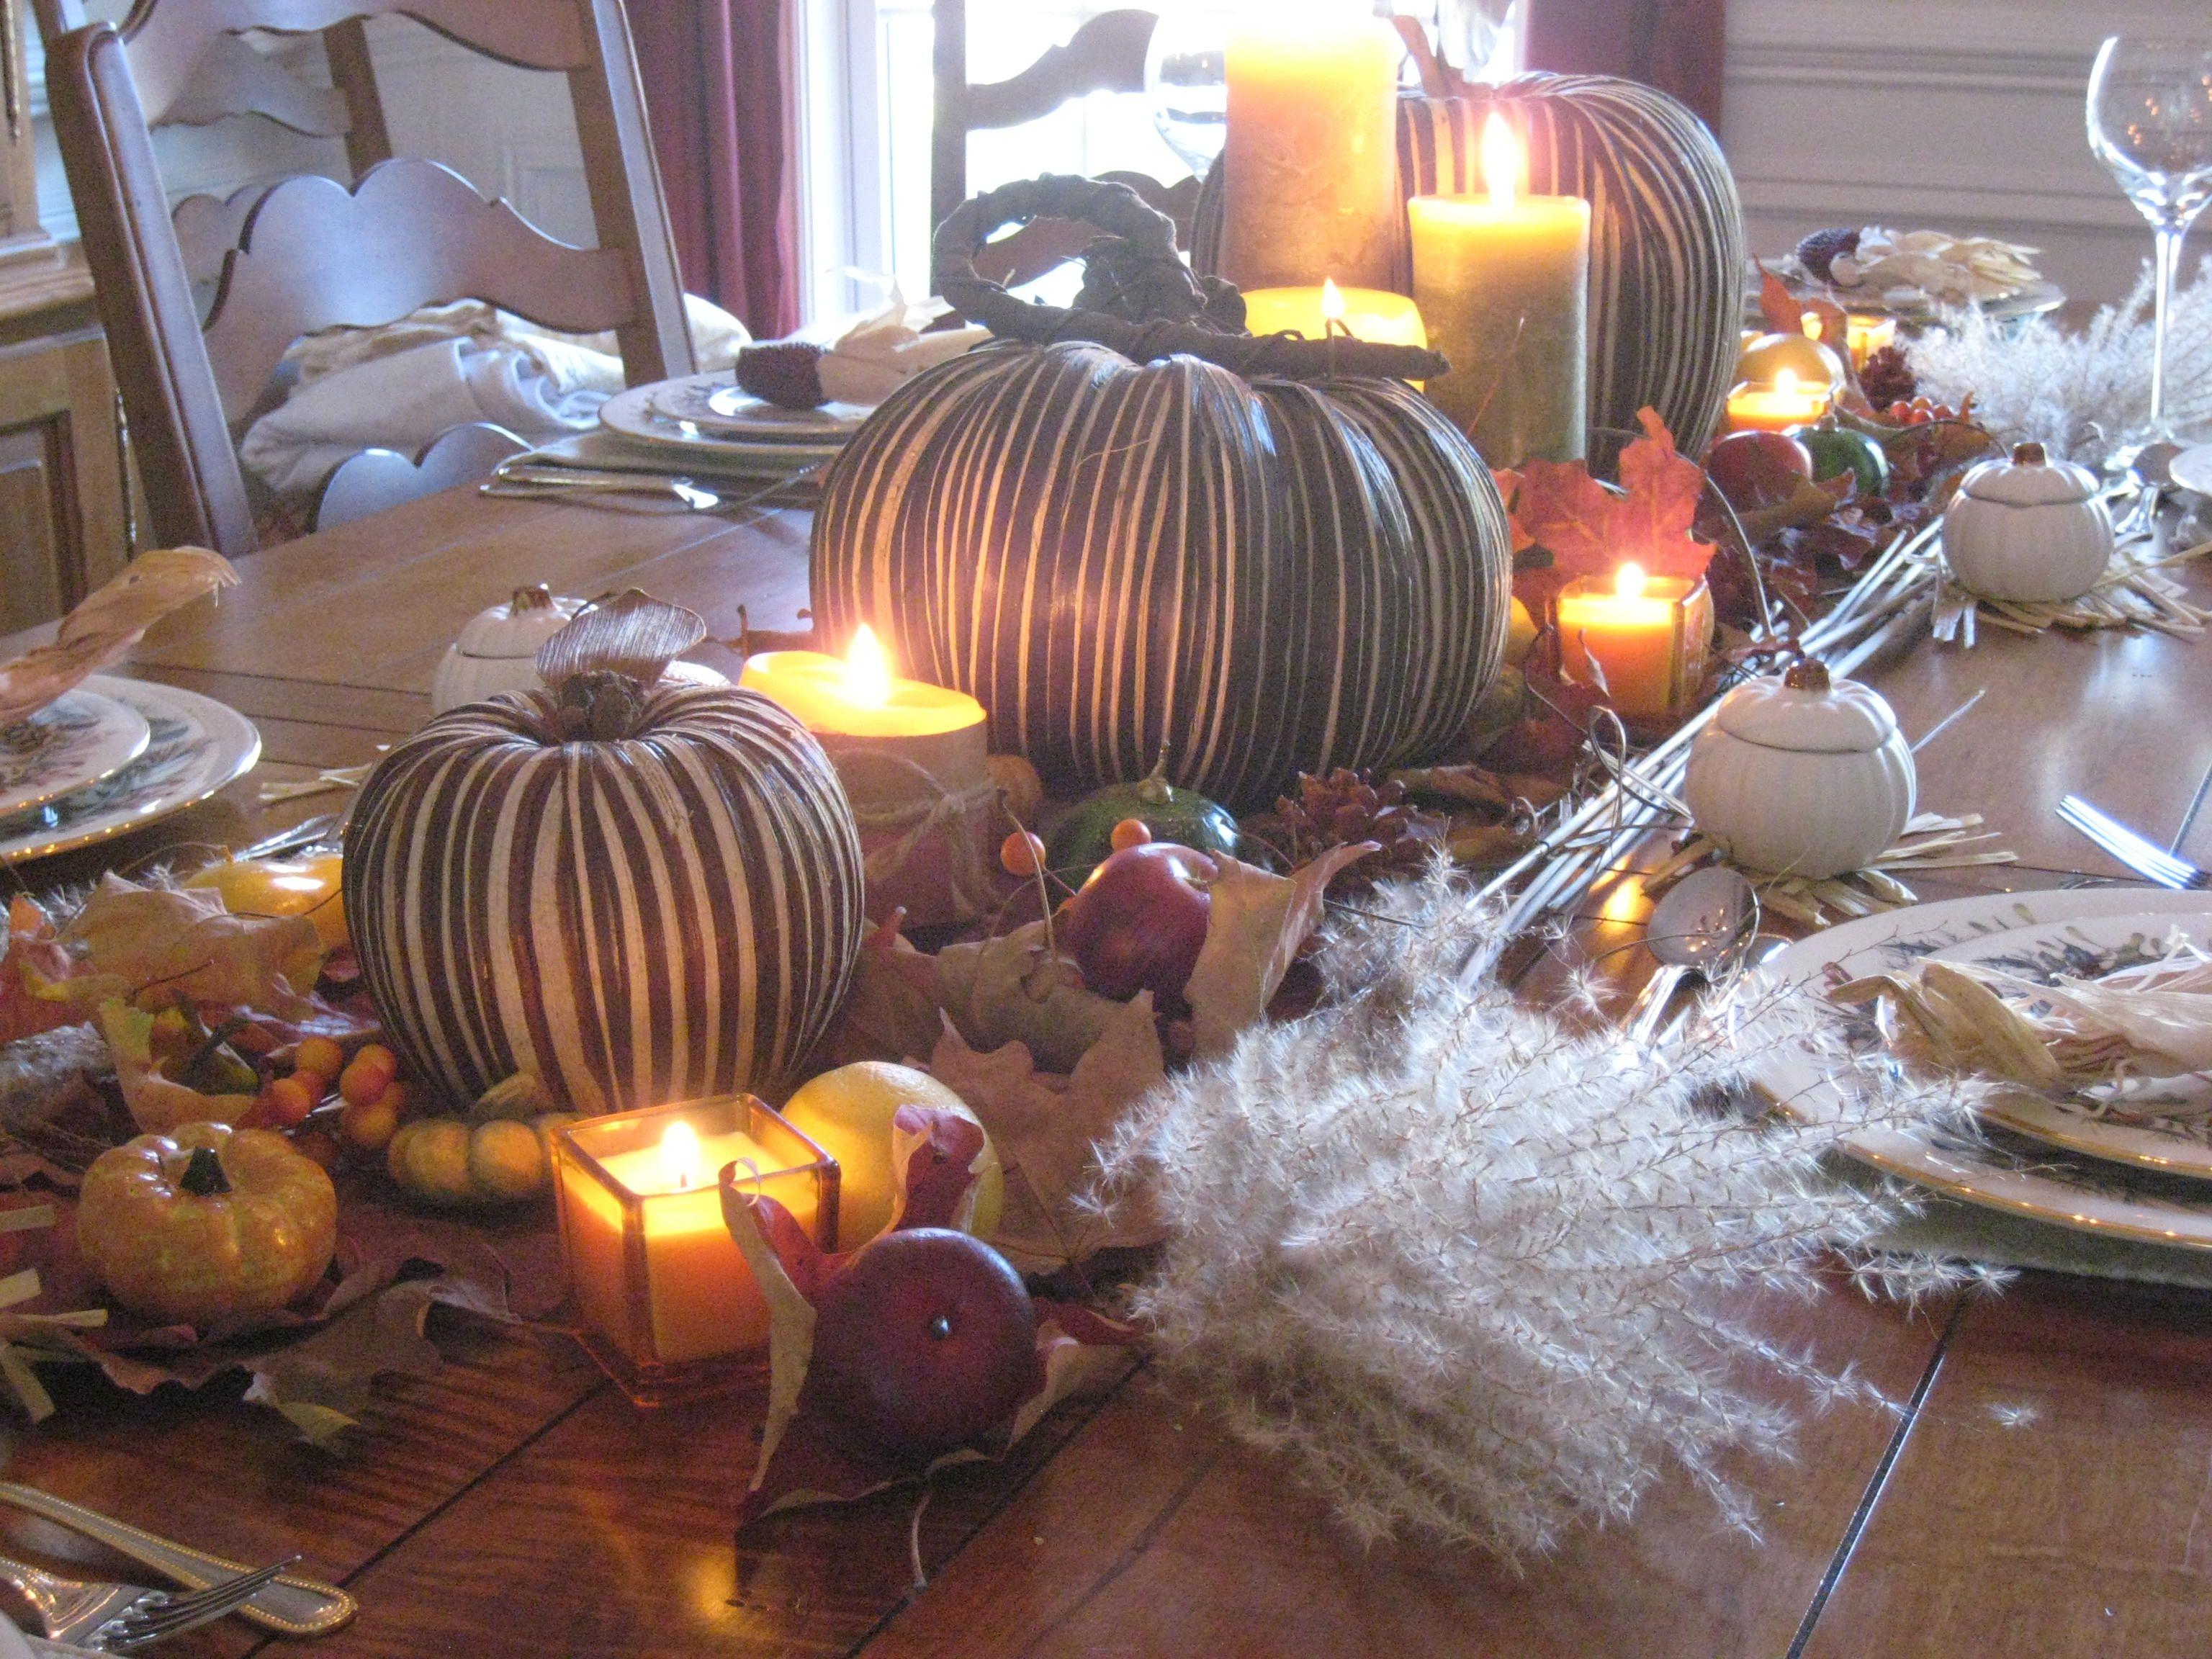 Thanksgiving table setting decorations pinterest - Pinterest deco table ...